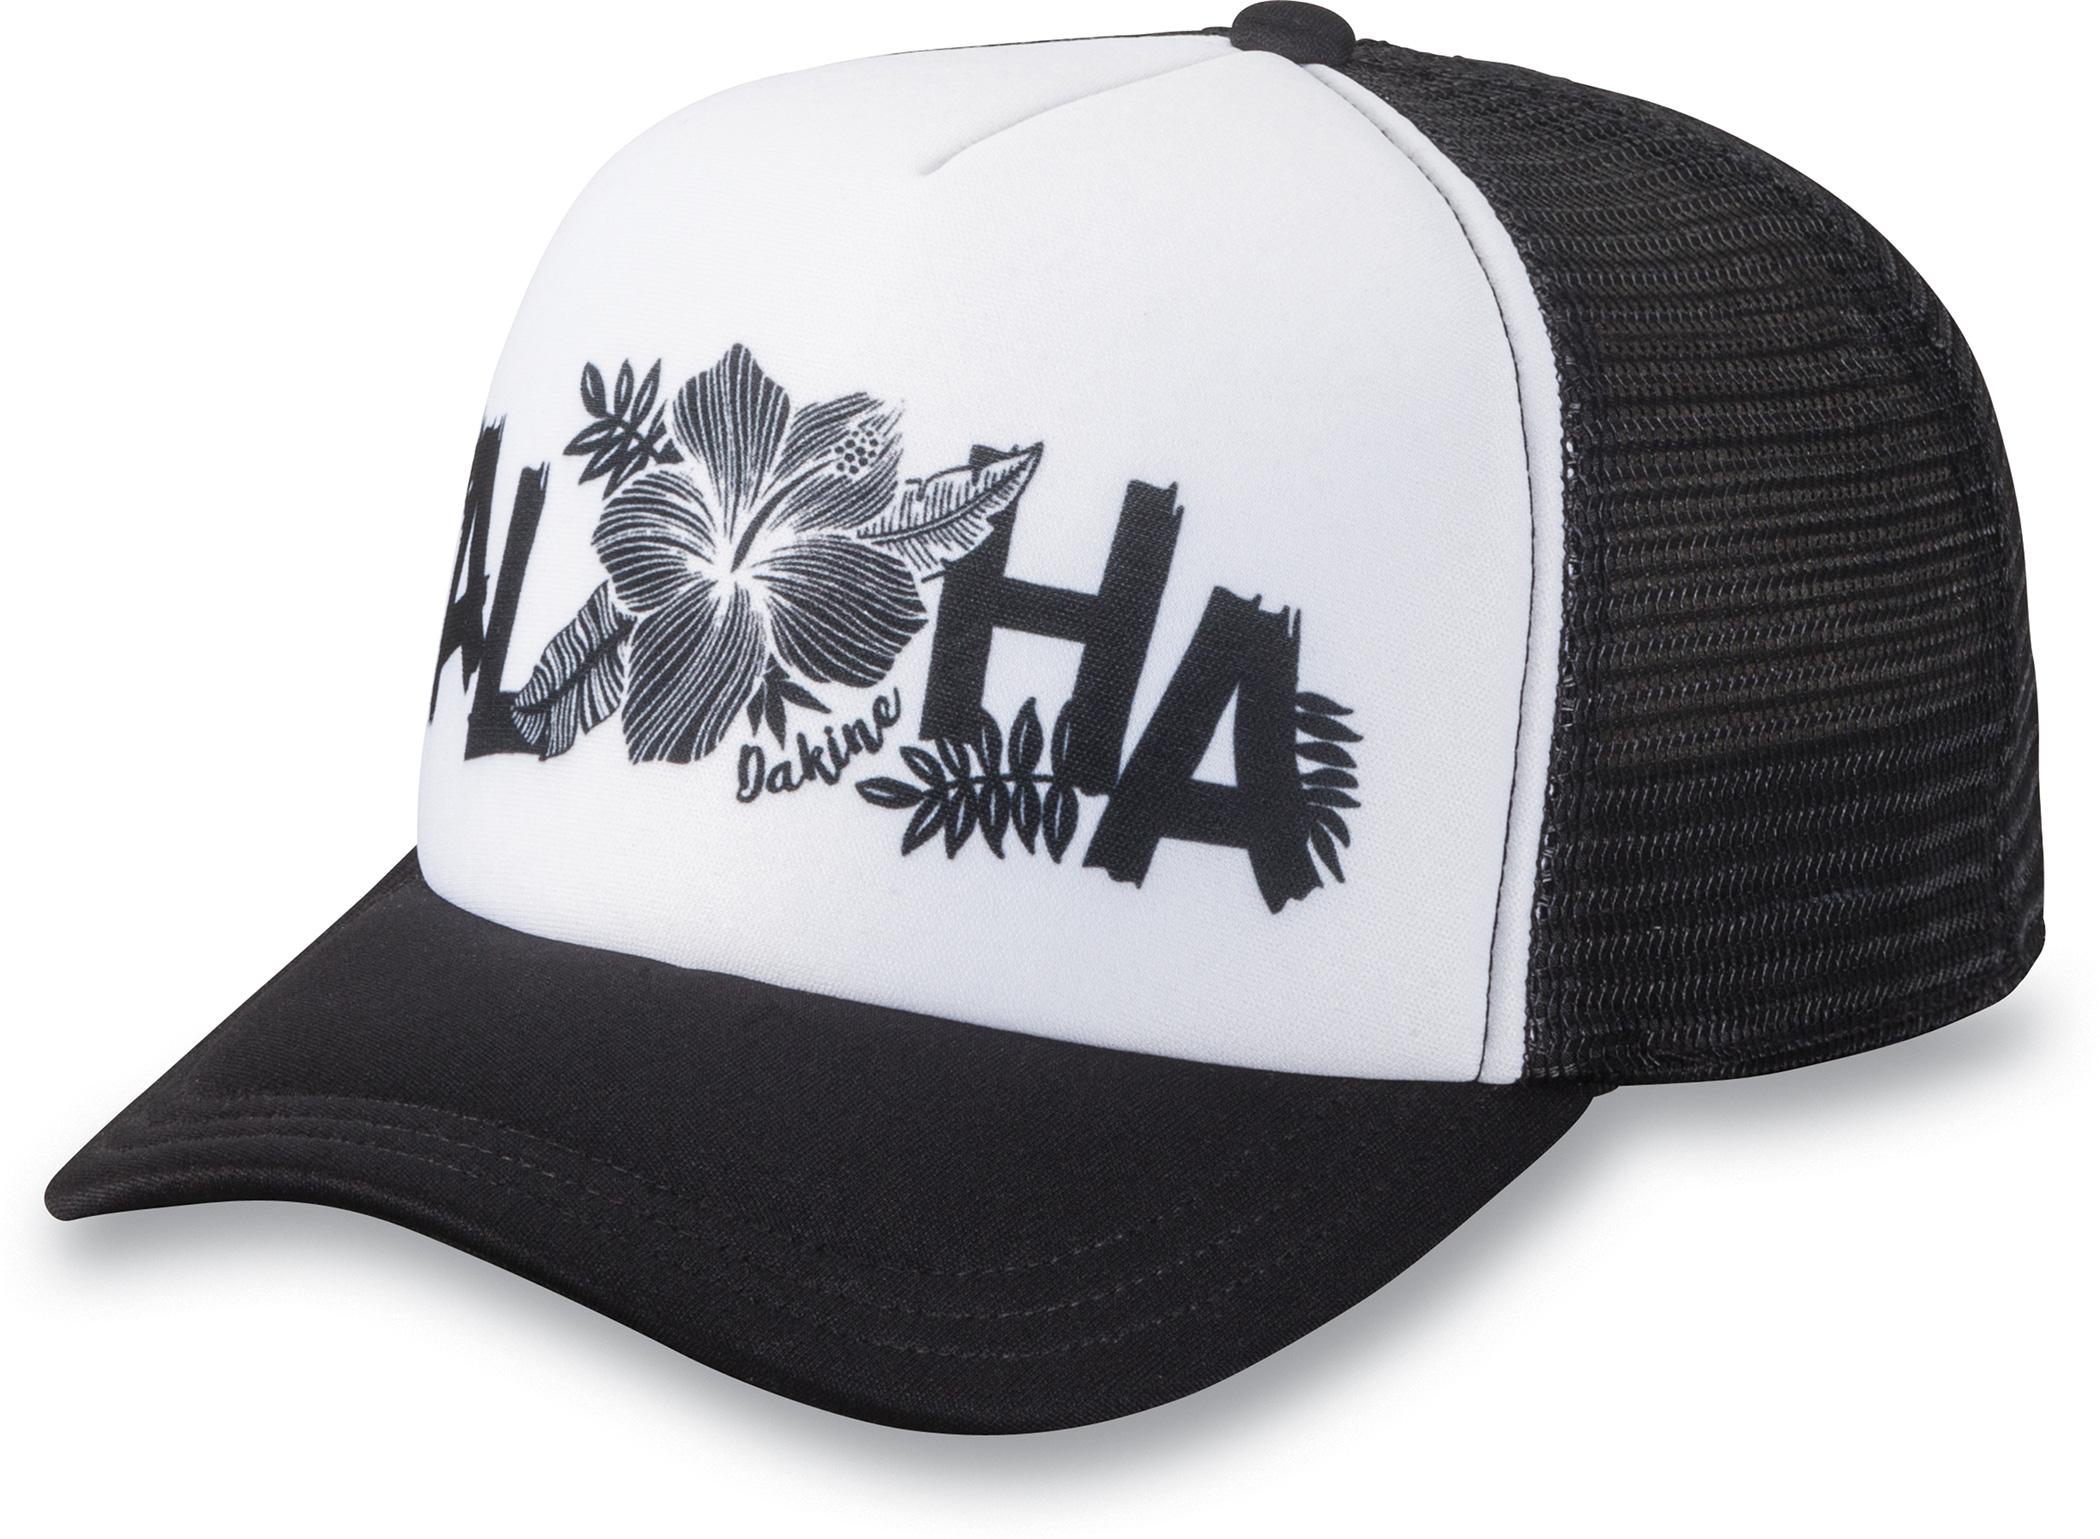 740f1ed16 Dakine Womens Aloha Trucker Black | | Caps & Hats | The Board Basement